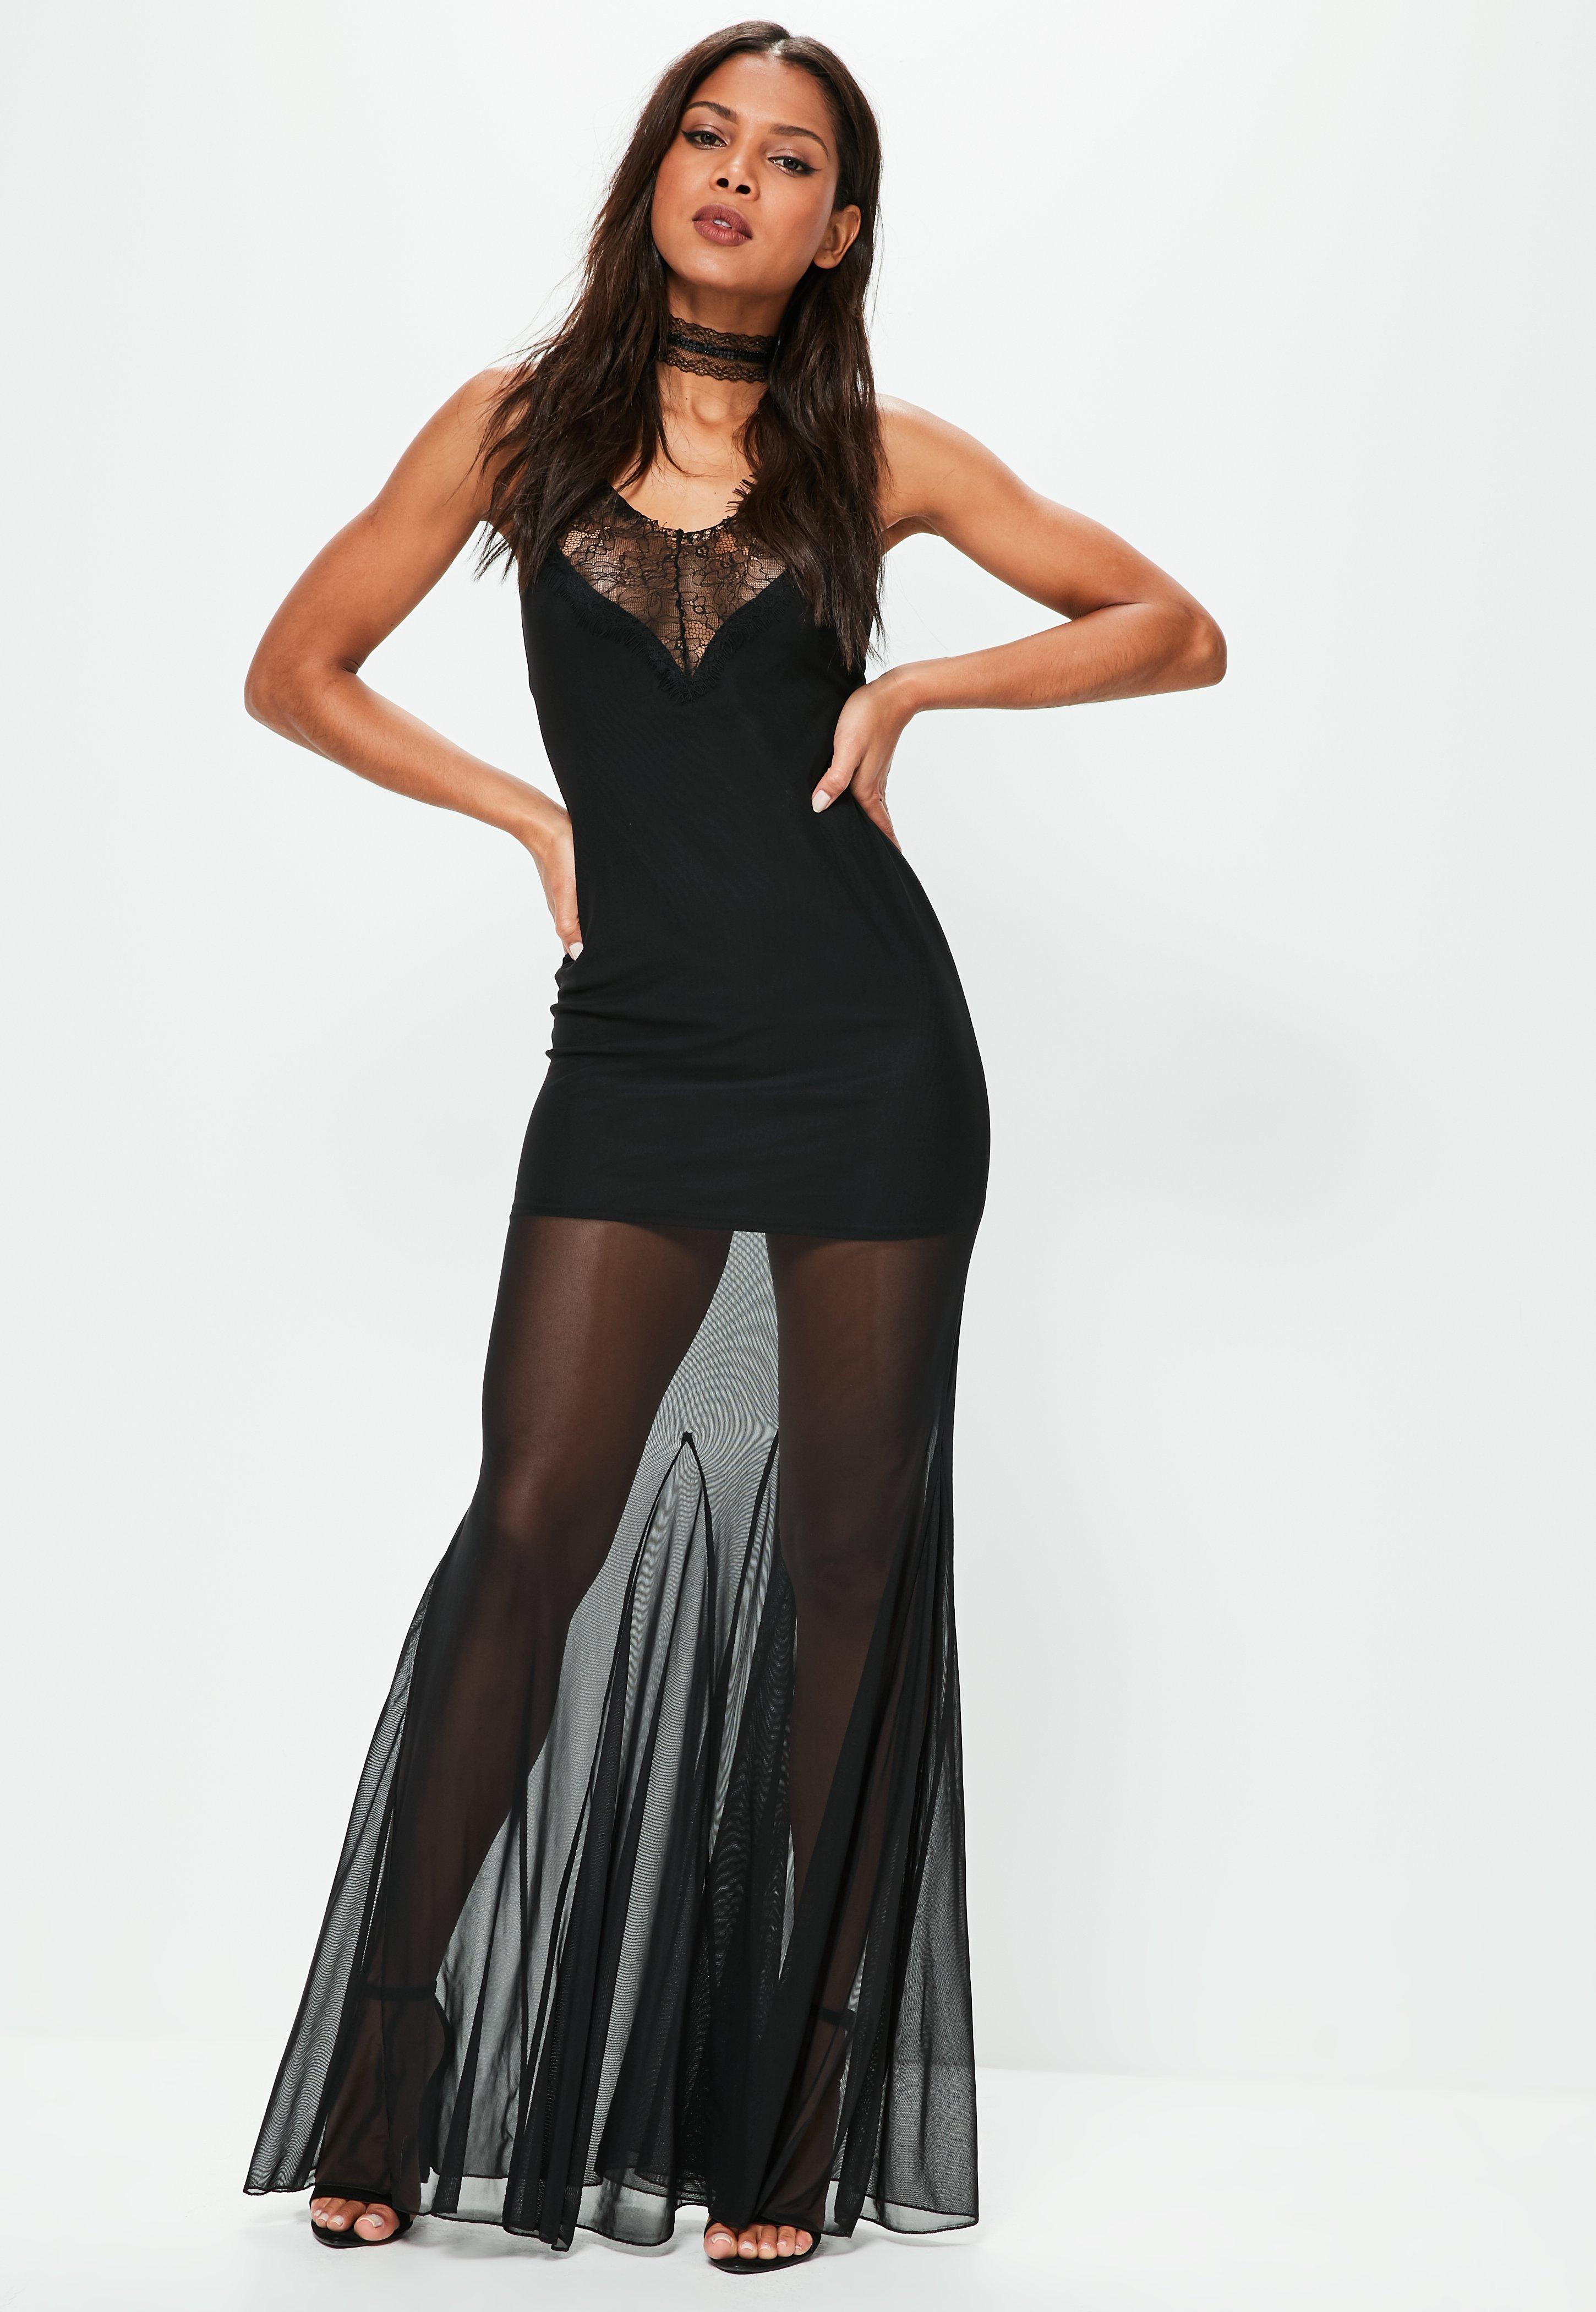 Missguided velvet racer high neck midi dress black in black lyst - Missguided Women S Black Strappy Mesh Lace Maxi Dress